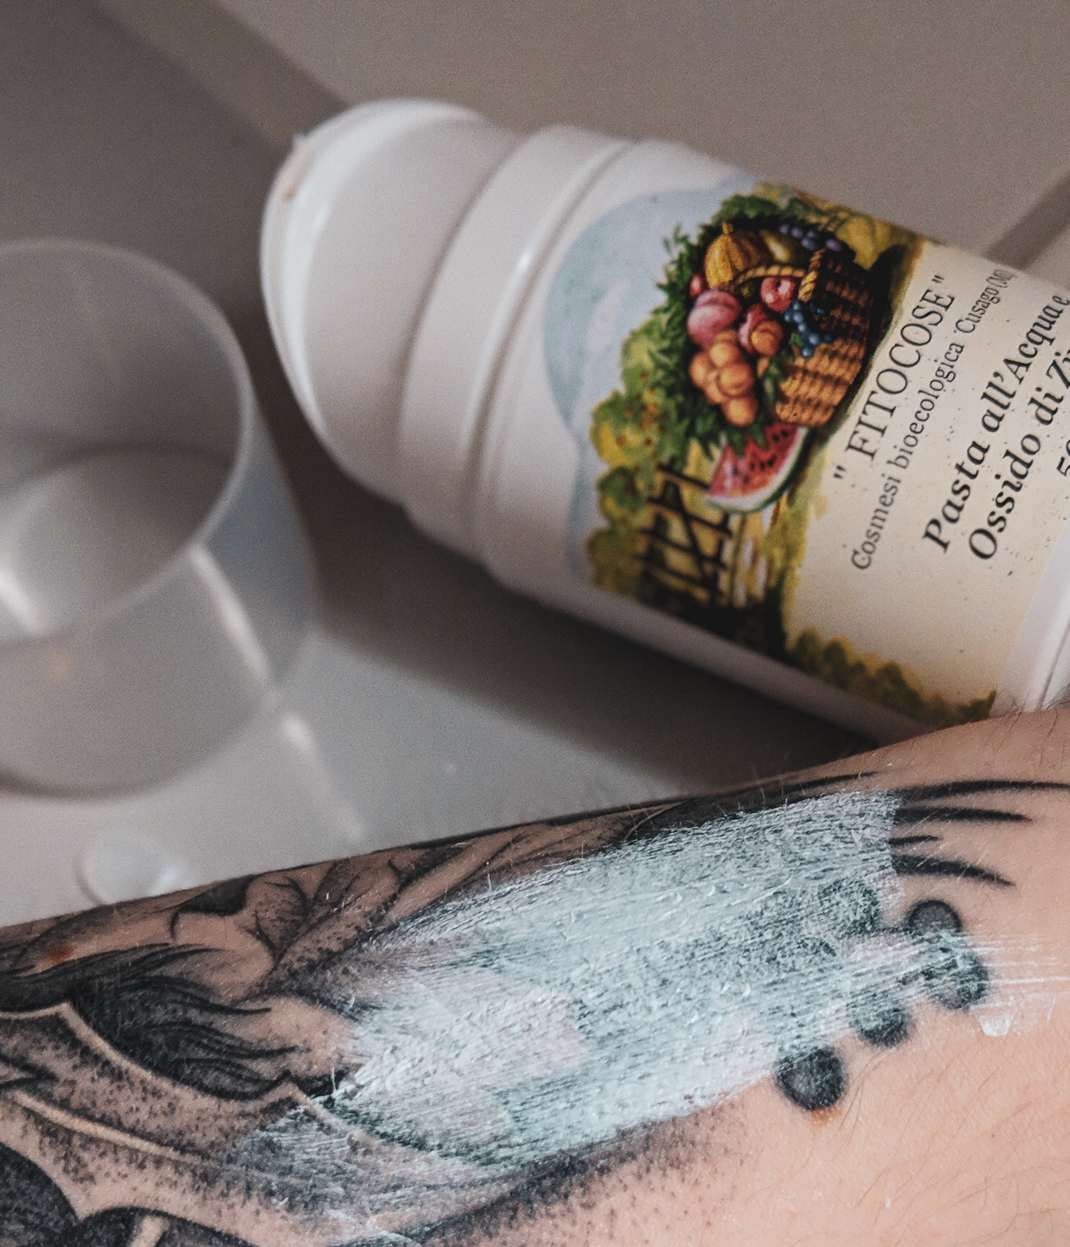 Vegan Beauty Haul Naturkosmetik cruelty free Ecco Verde Kosmetik Gesichtspflege Fitocose Water & Zinc Oxide Paste (1)